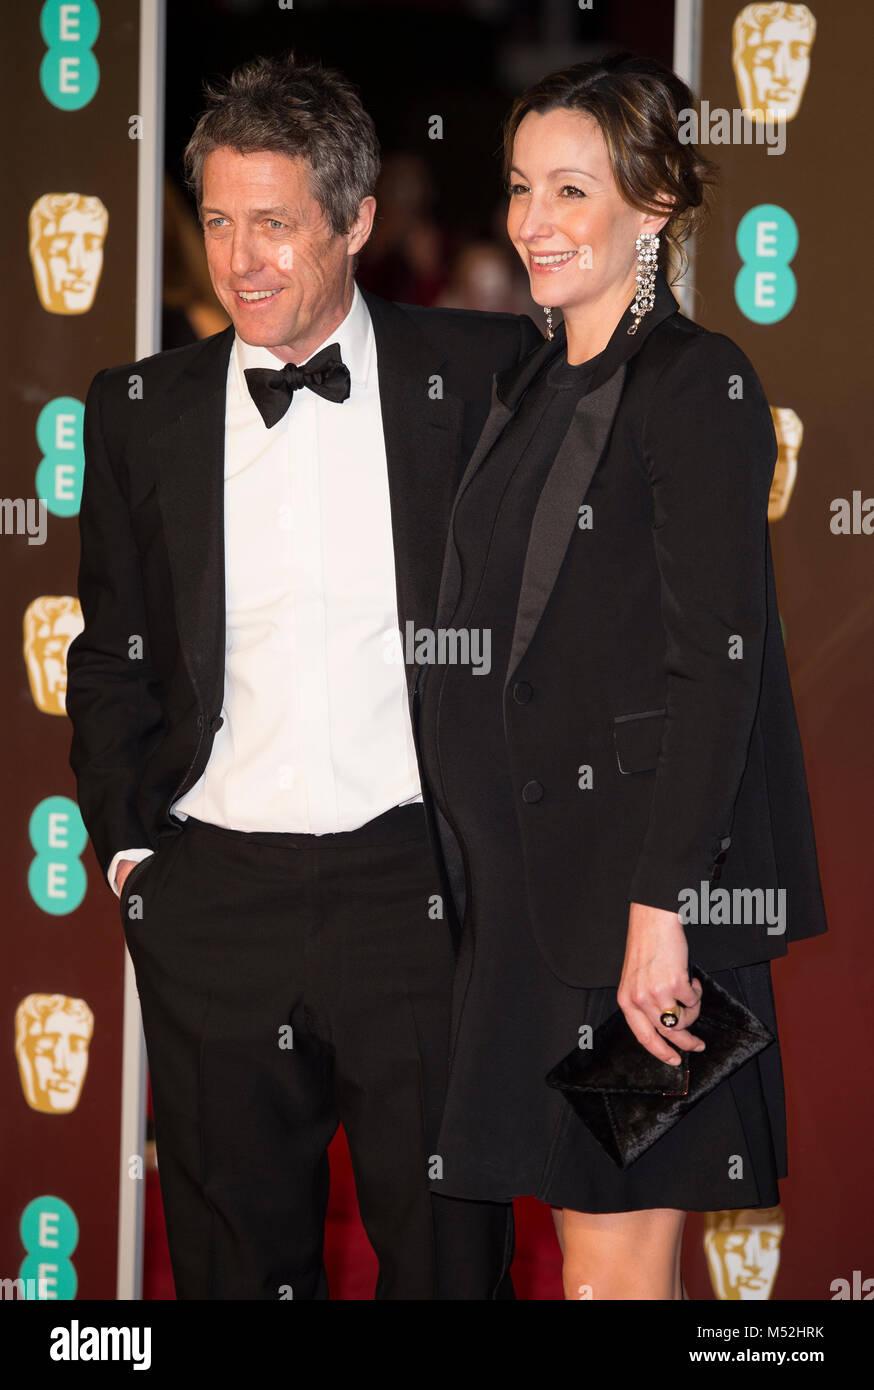 2998d78239e1 Hugh Grant attends the EE British Academy Film Awards (BAFTA) held at Royal  Albert Hall on February 18